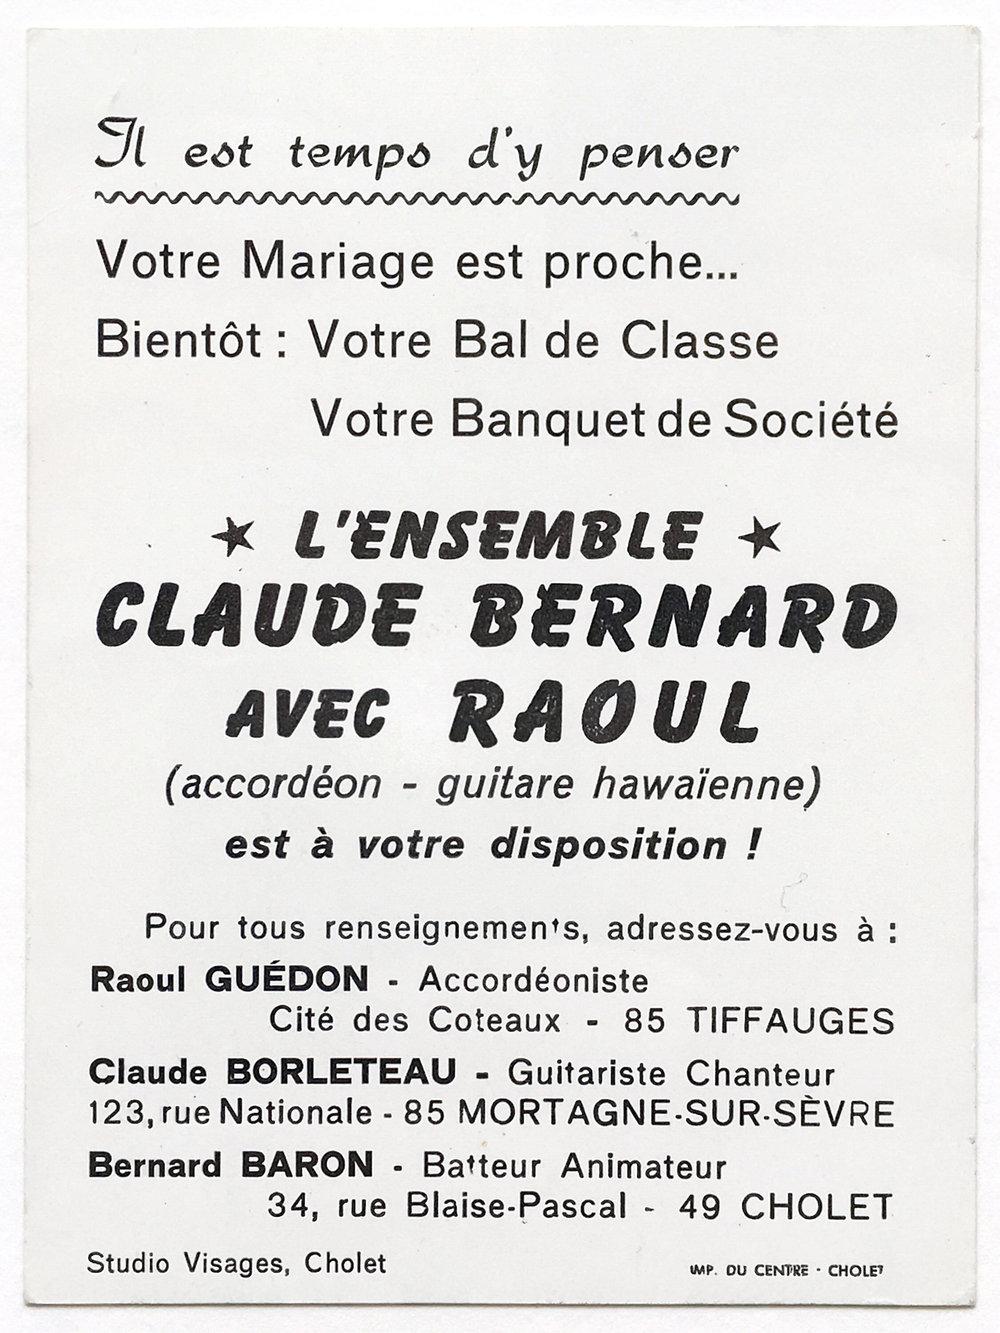 Raoul.music.accordeon.guédon.02.jpg